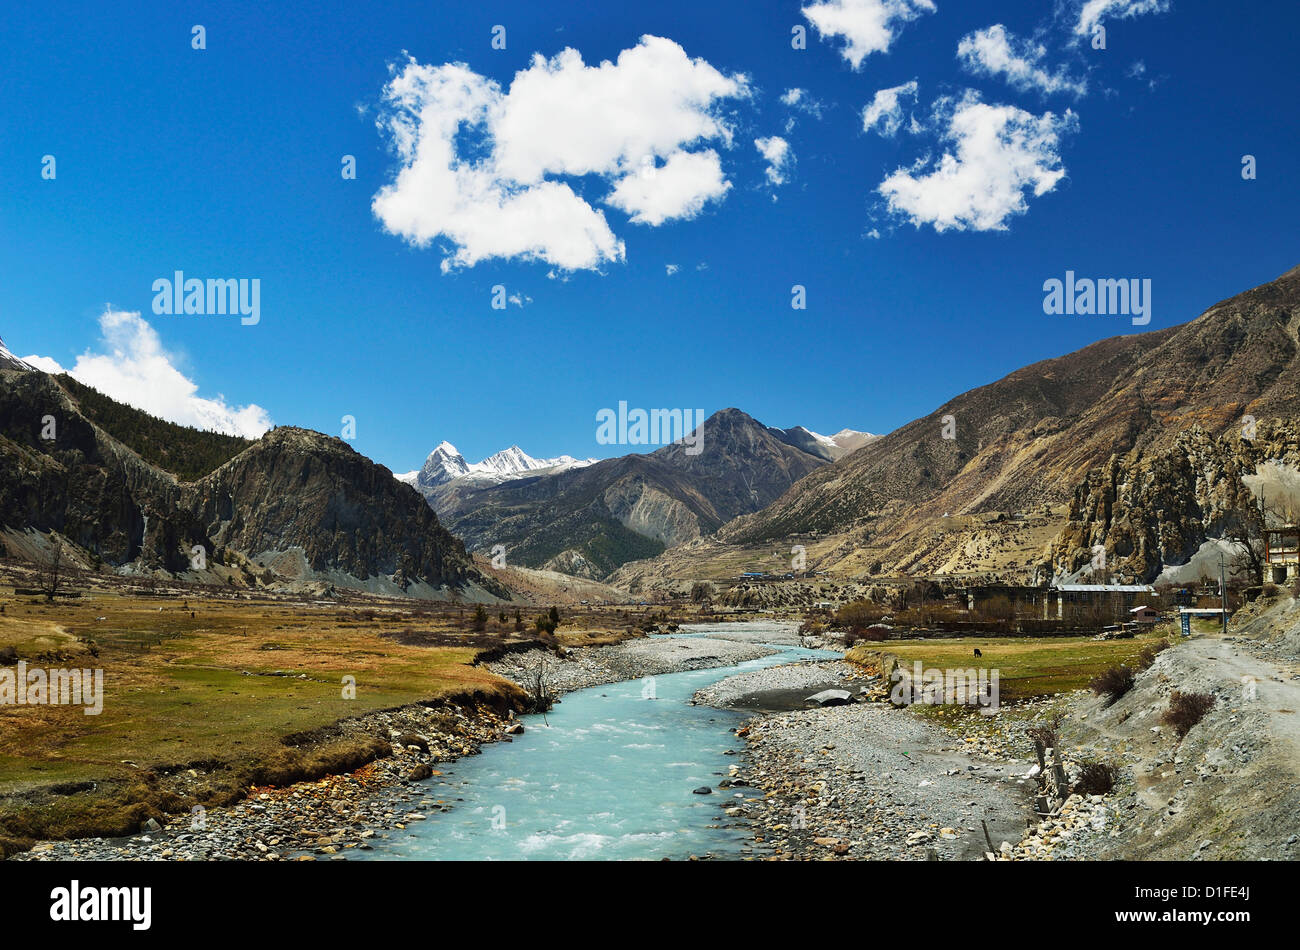 Marsyangdi River Valley, Annapurna Conservation Area, Gandaki, Western Region (Pashchimanchal), Nepal, Asia - Stock Image